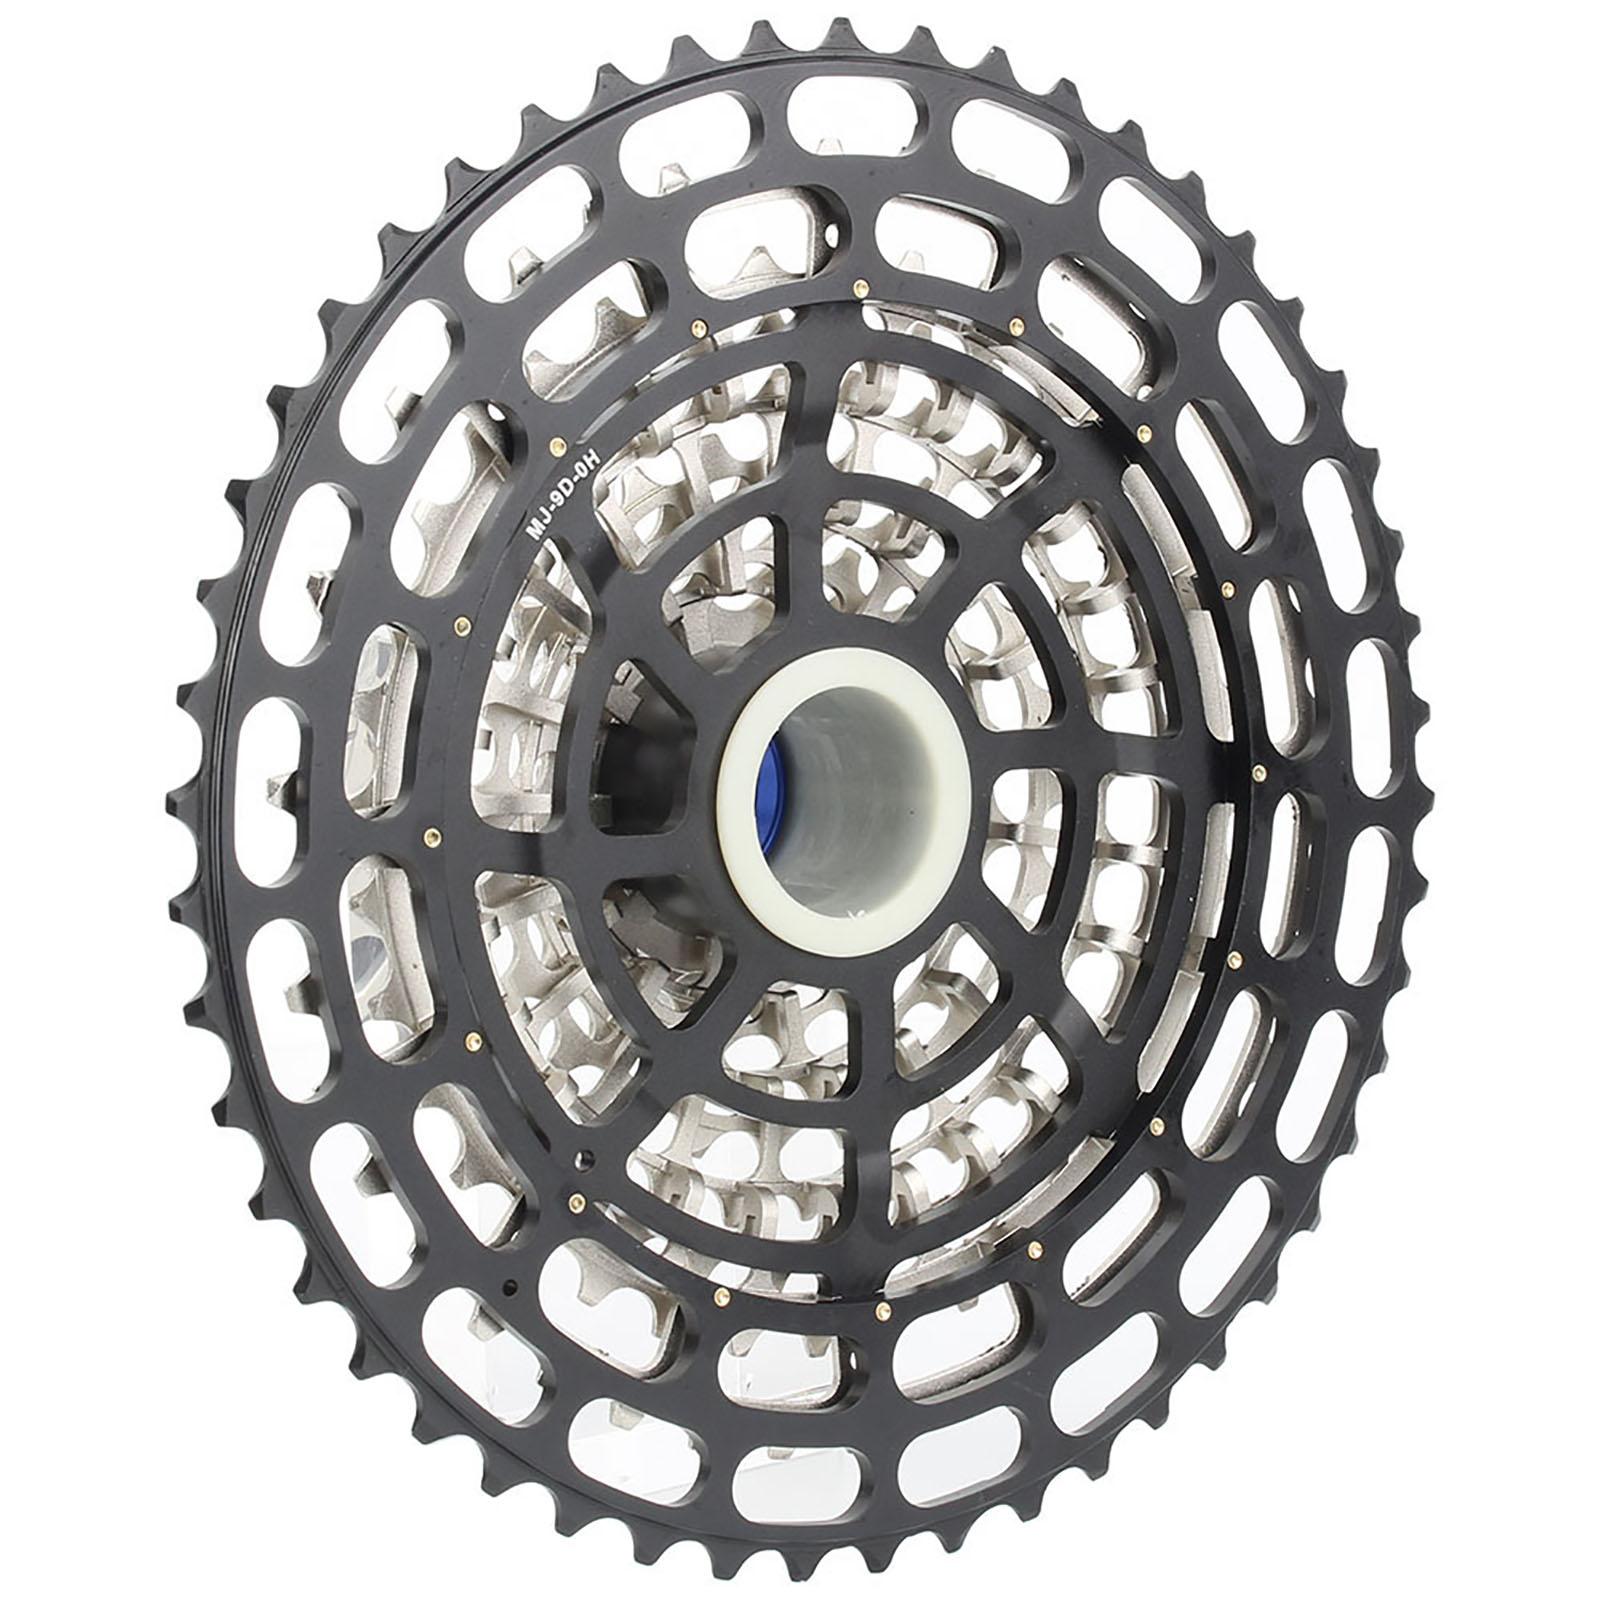 ZTTO-12-Speed-Cassette-10-50T-11-50T-Freewheel-Mountain-Bike-Sprocket-Compatible thumbnail 16